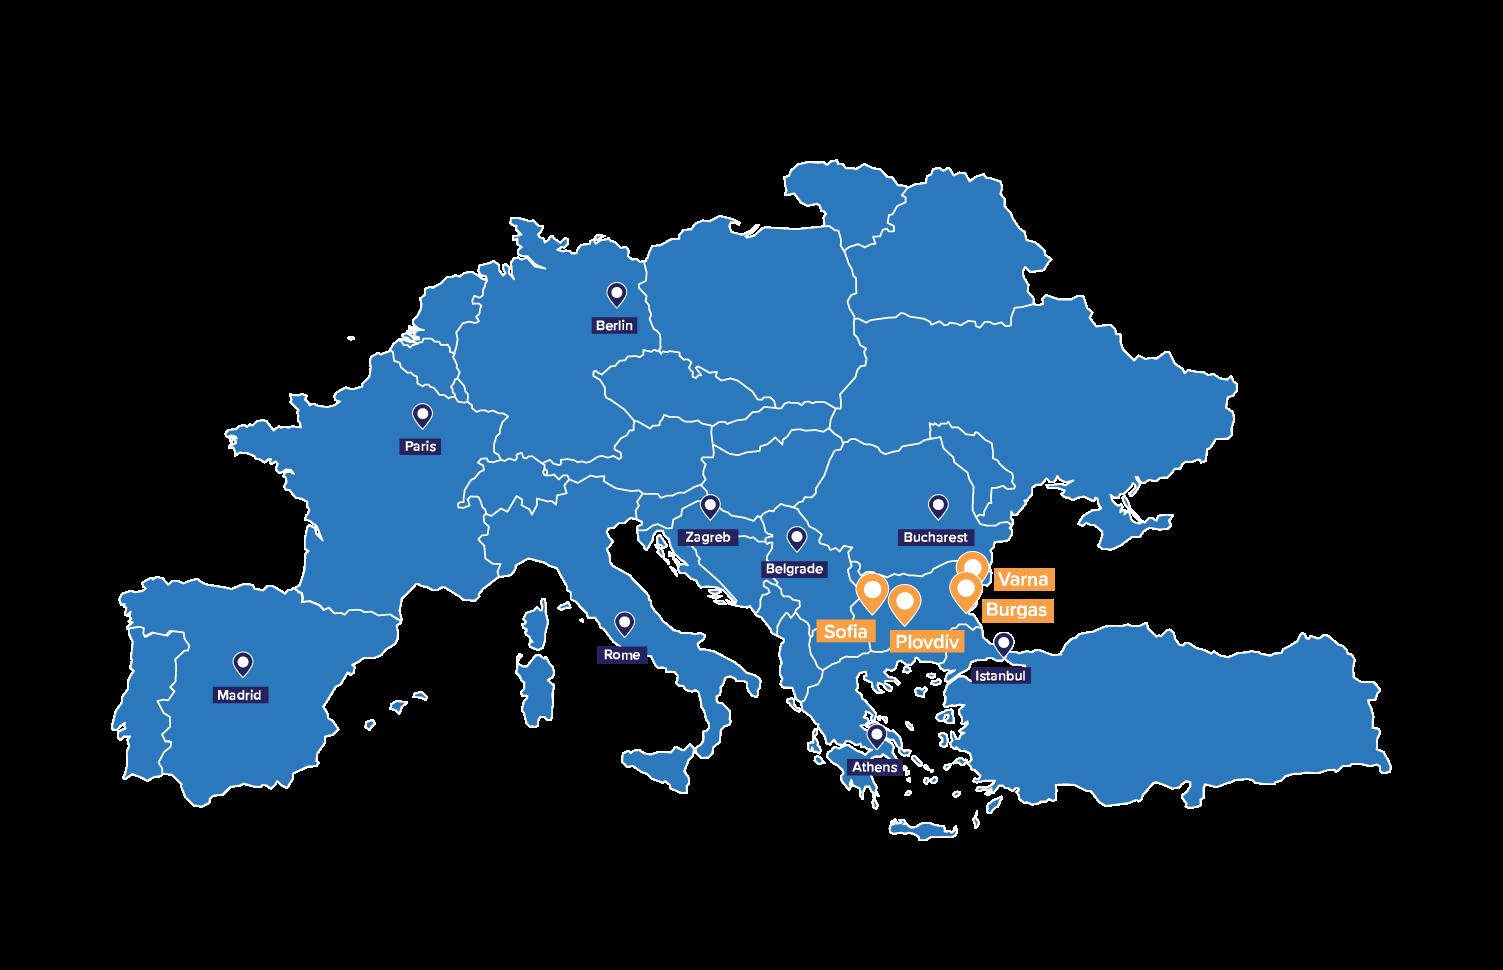 Europe map website